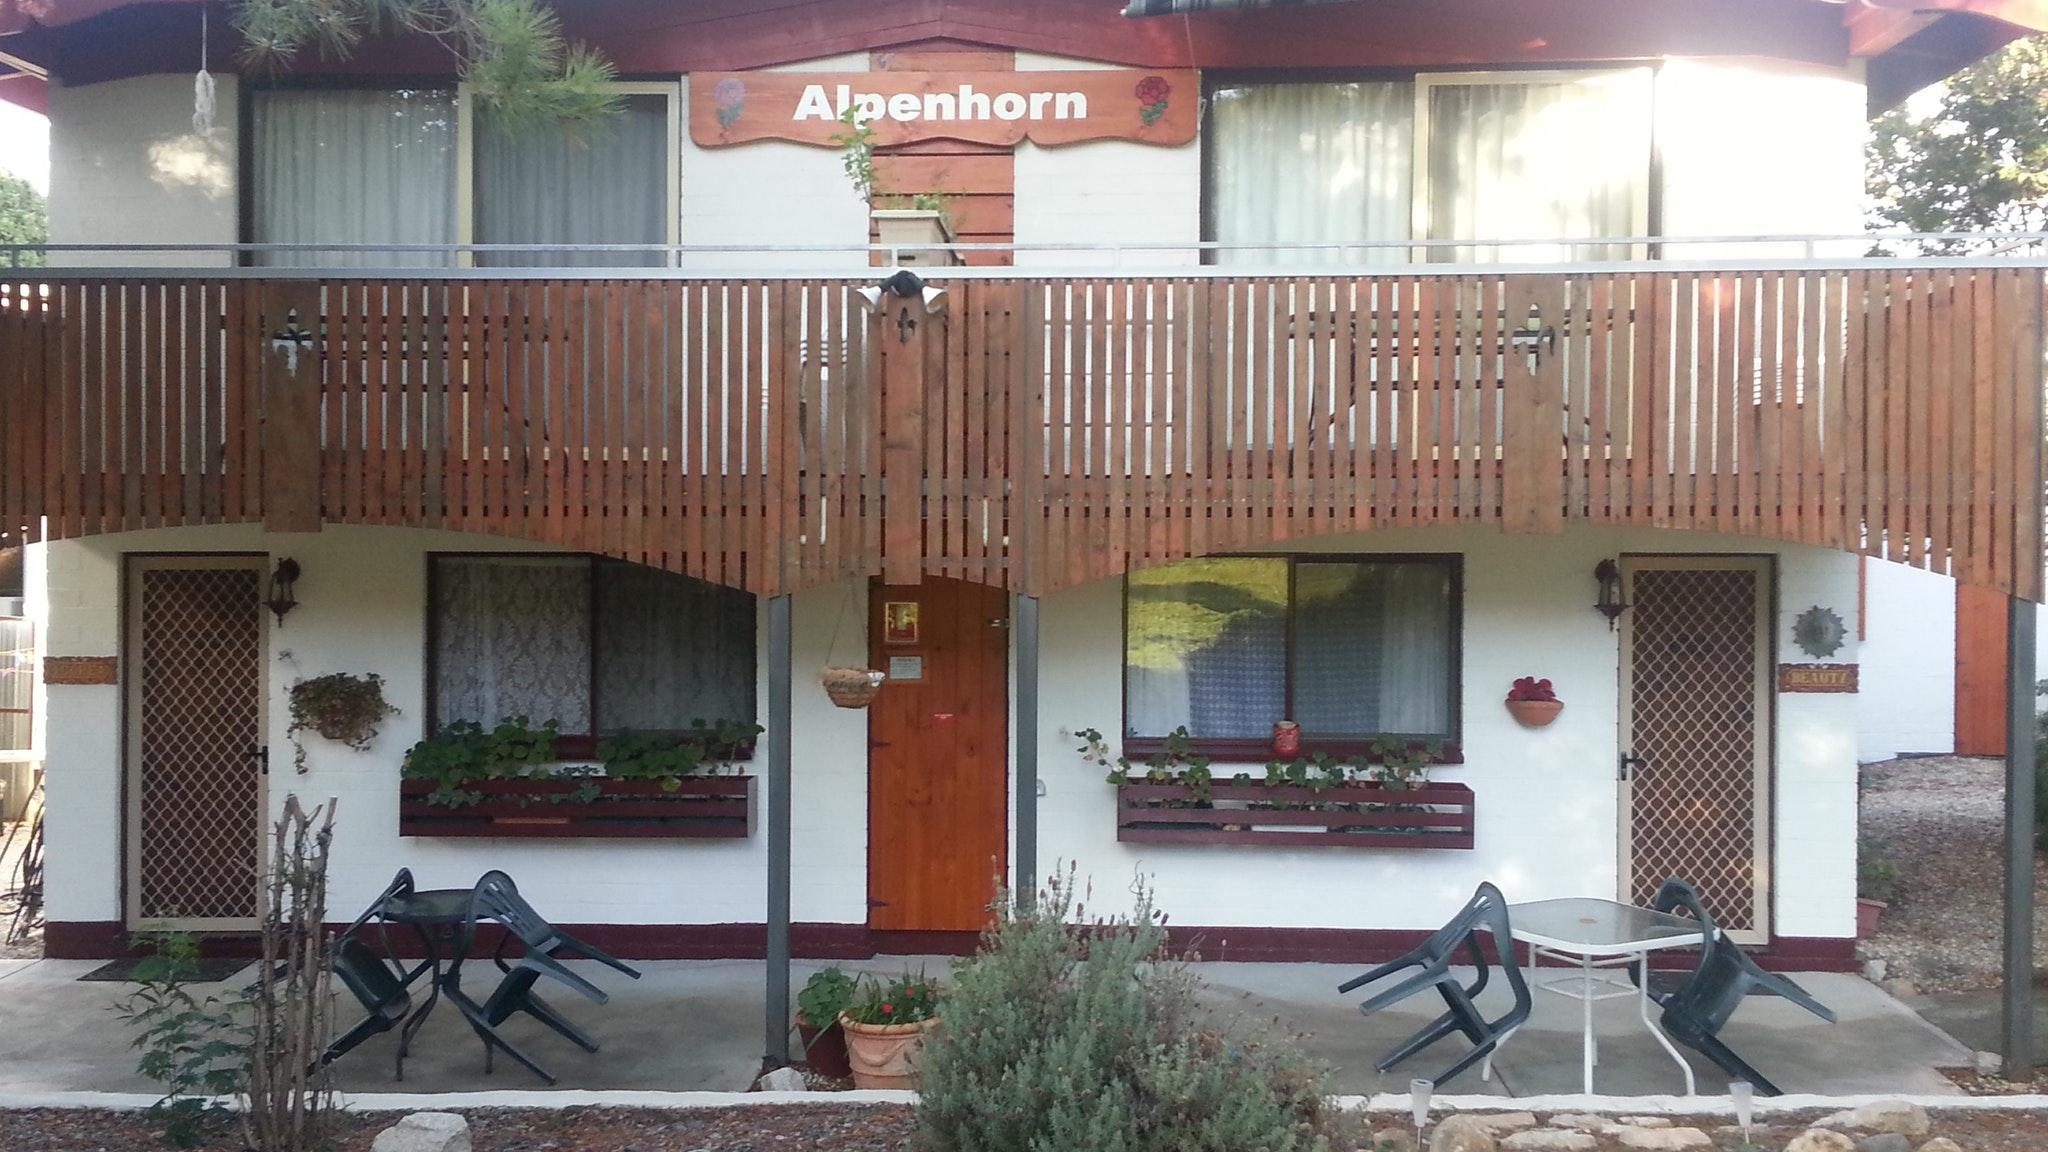 Alpenhorn Holiday Units